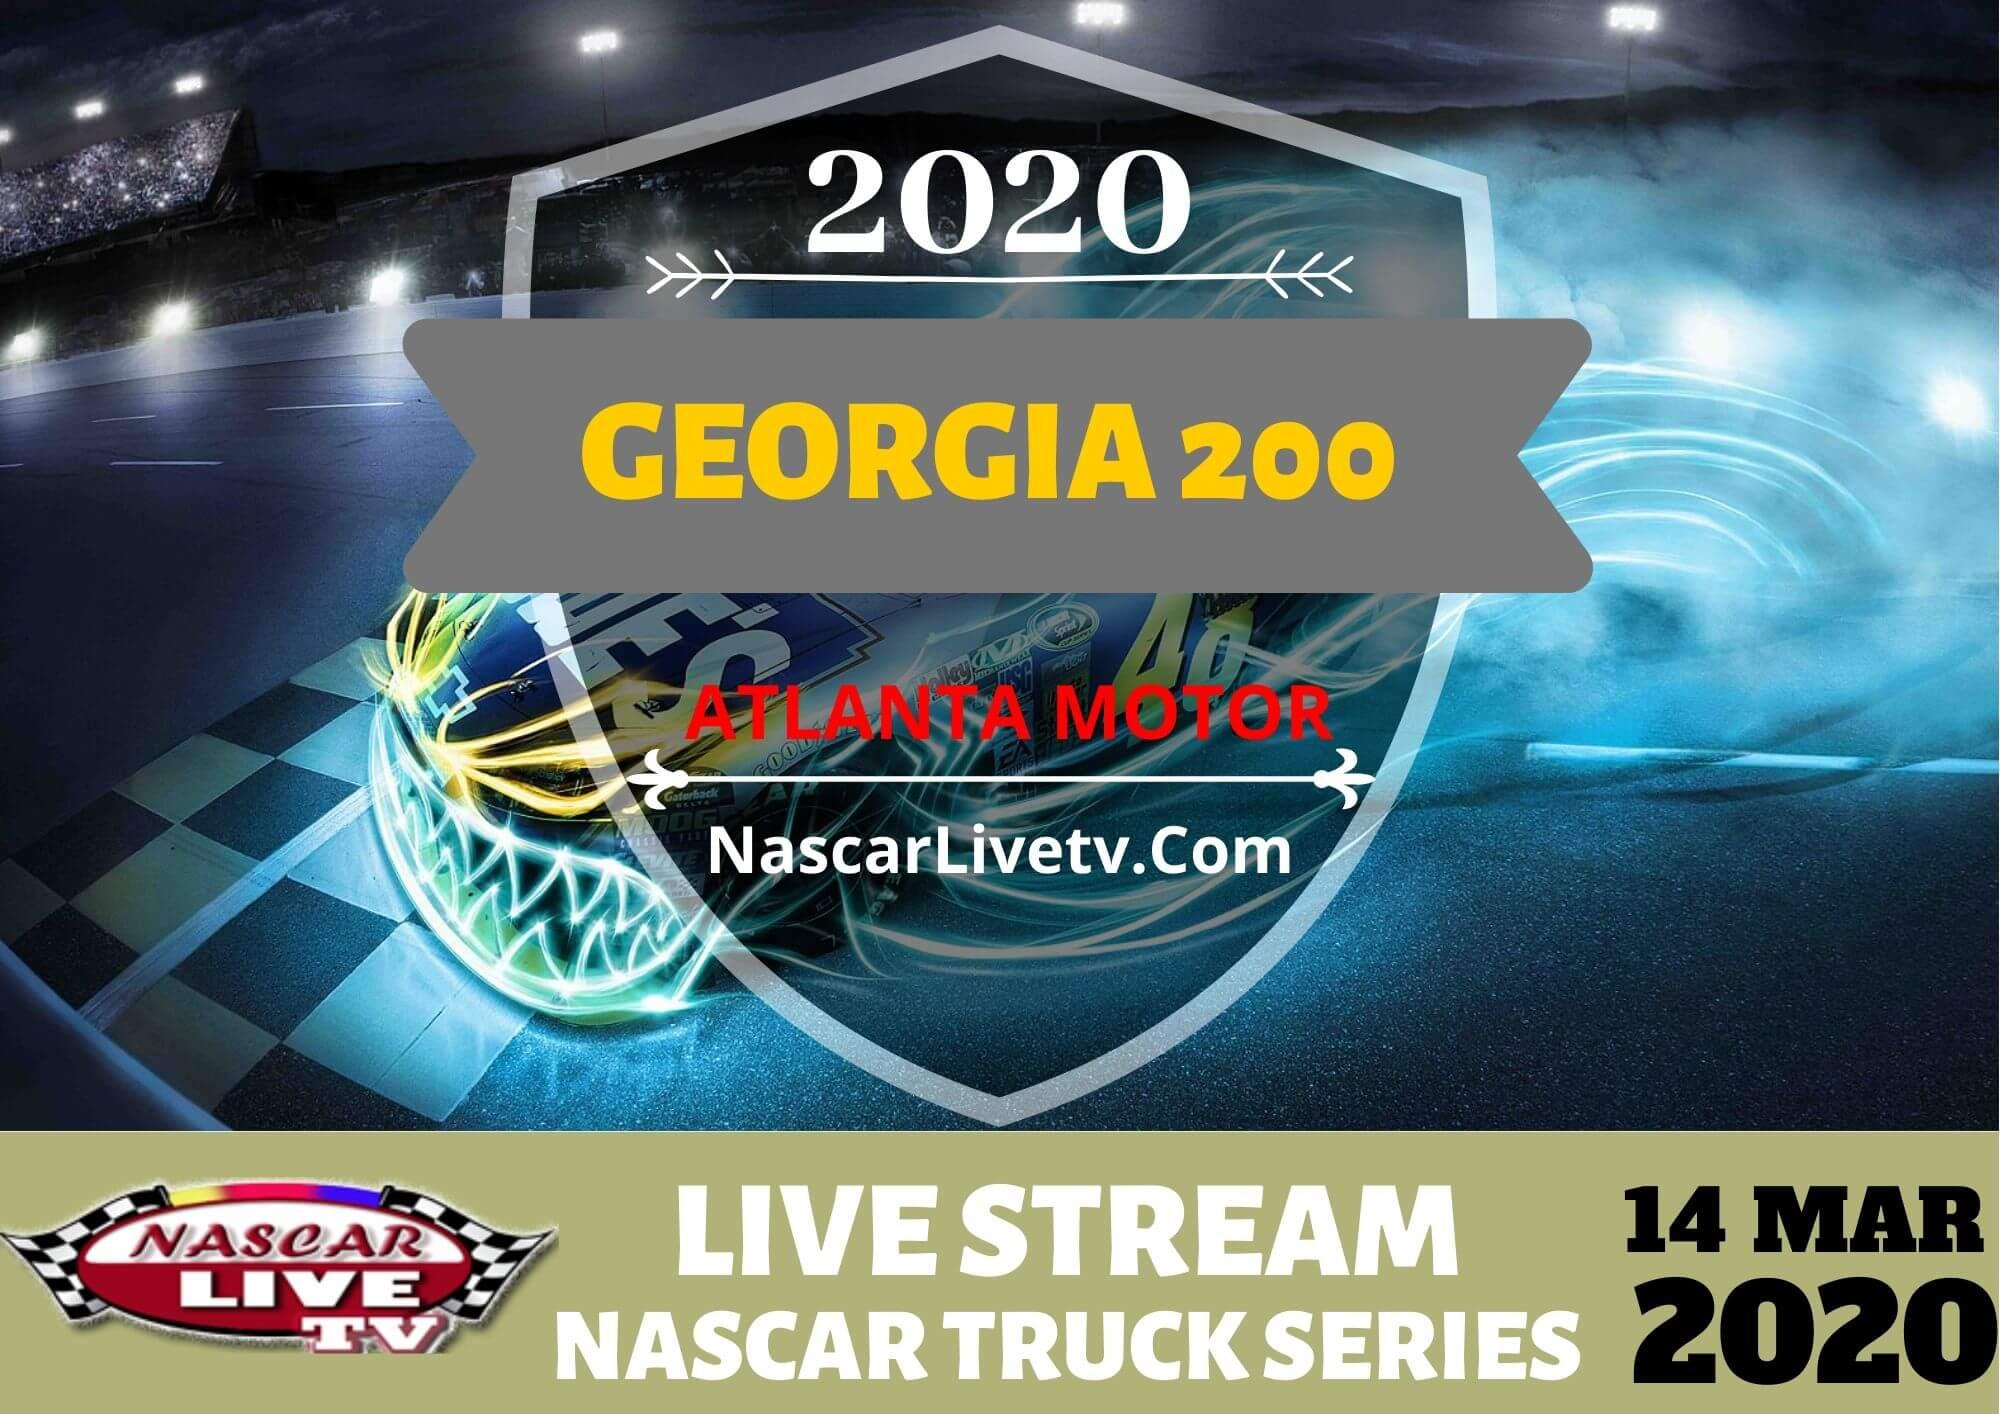 NGOTS Georgia 200 Live Stream 2020